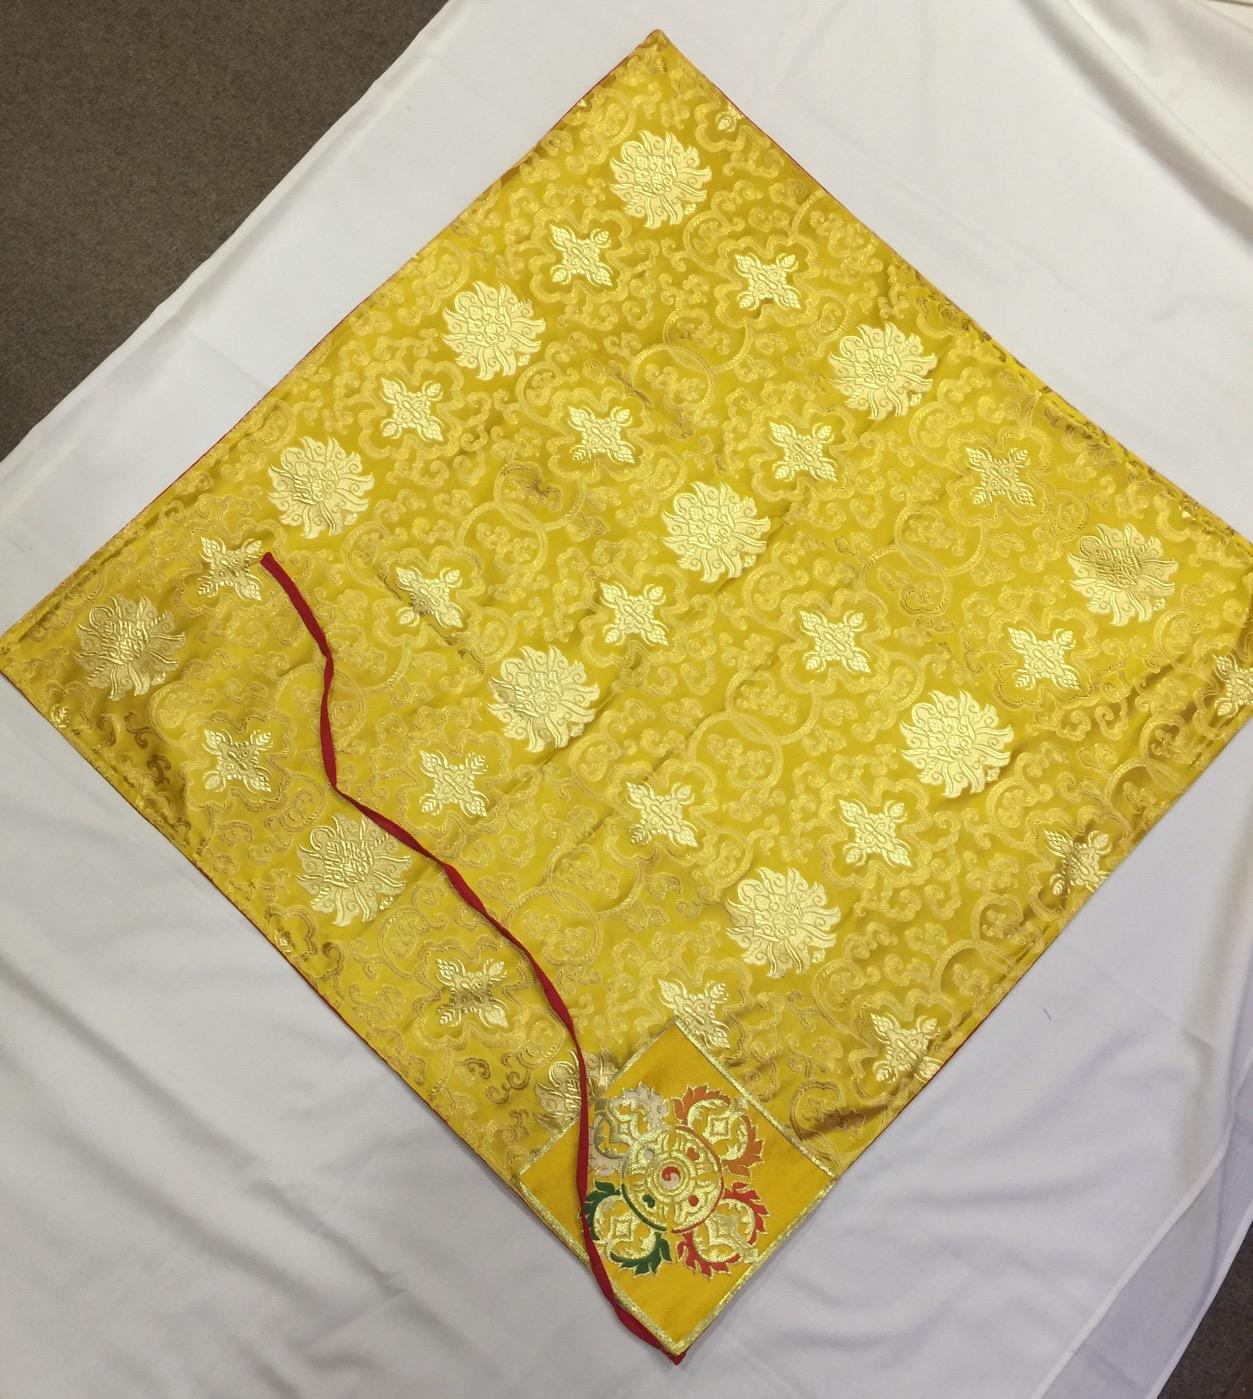 Tibetan Buddhist Dharma Text Cover / Book Wrapper